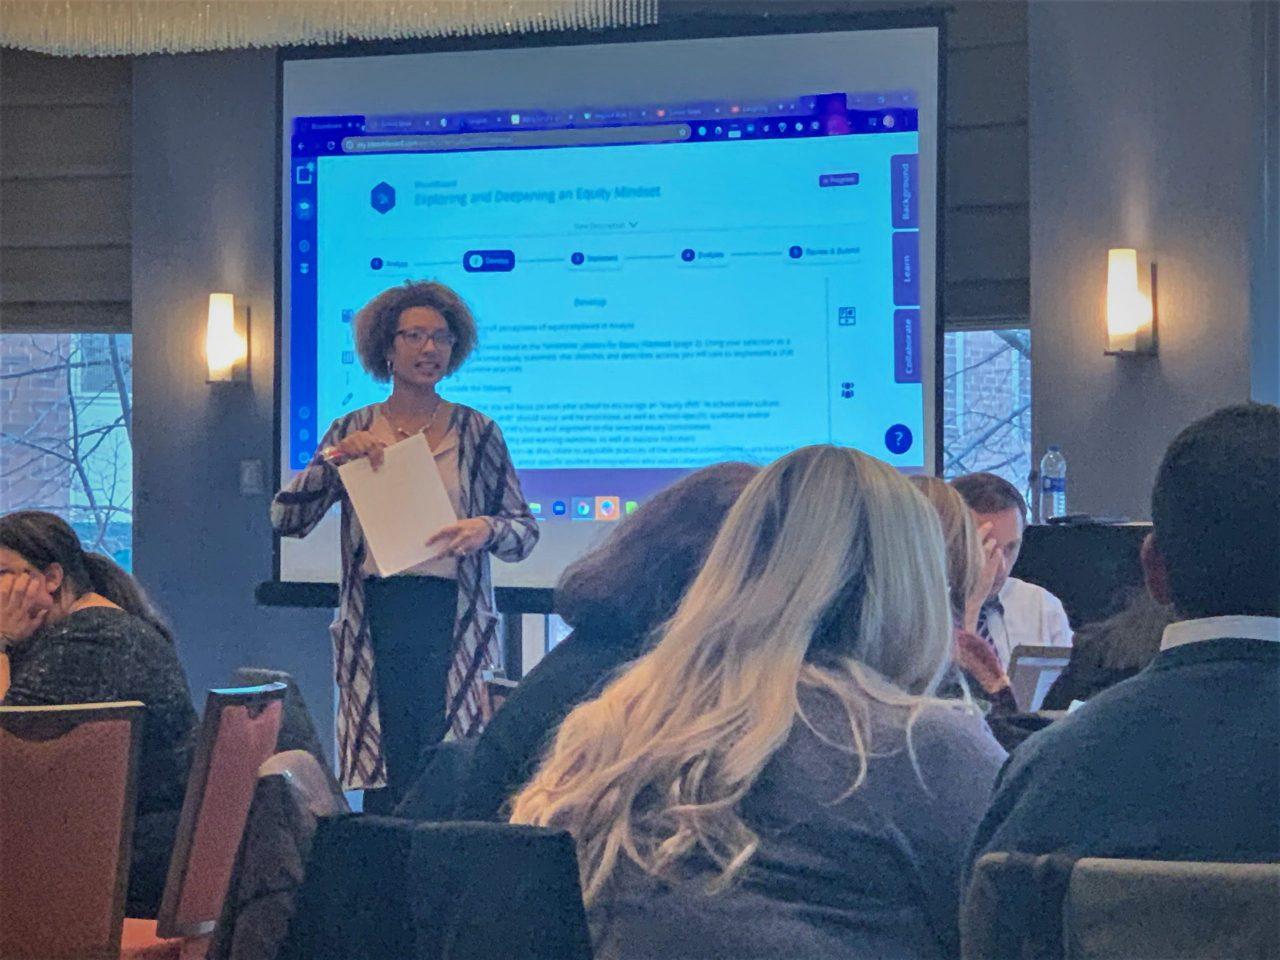 Presentation at the ESSA conference